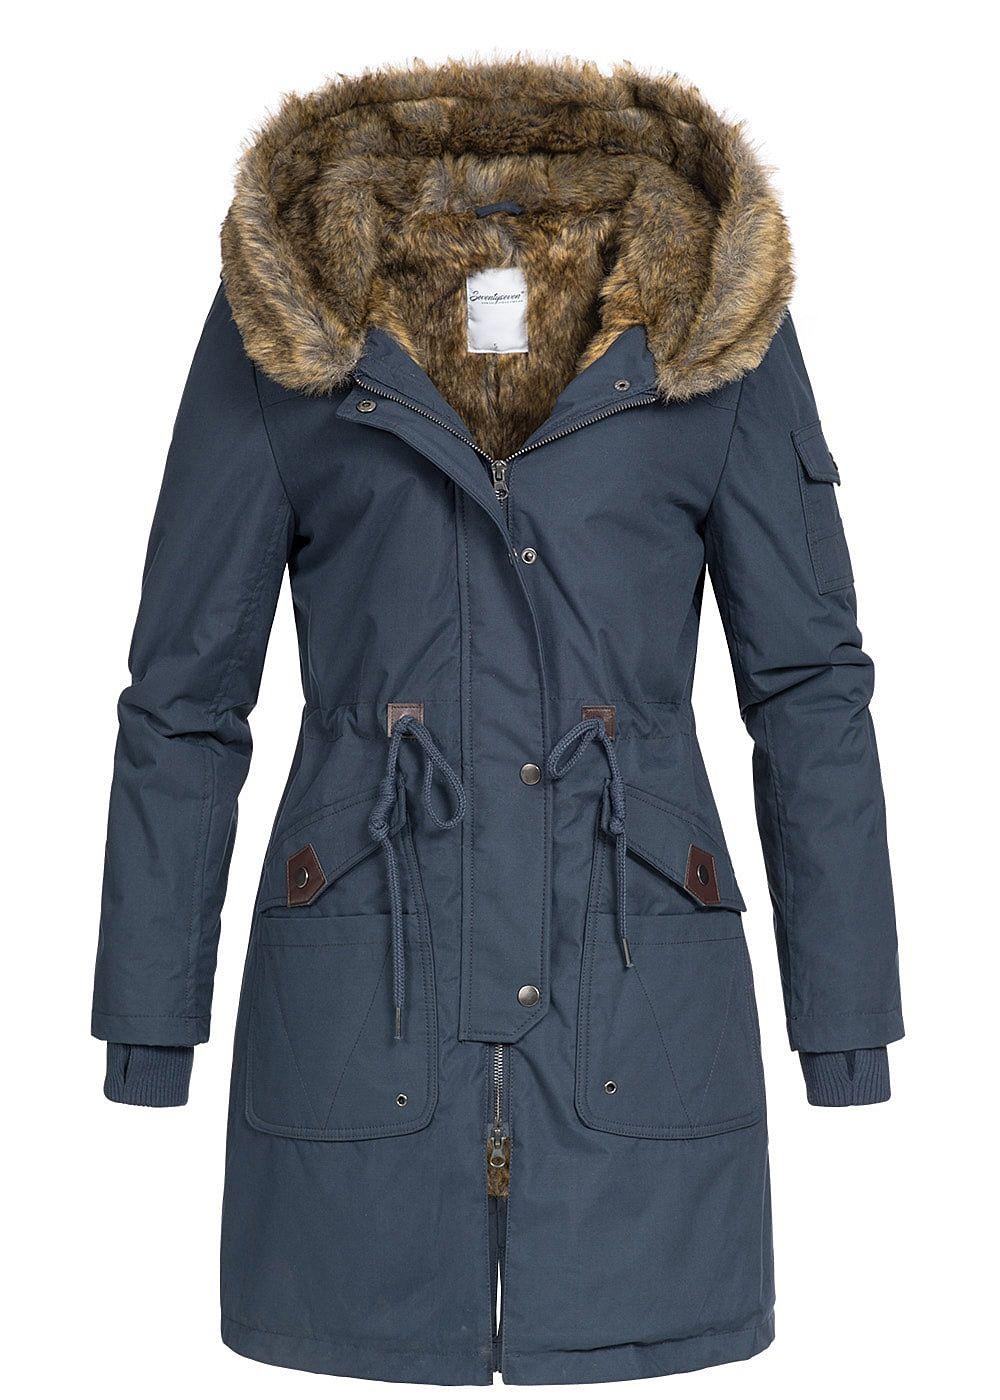 Blaue mantel jacke